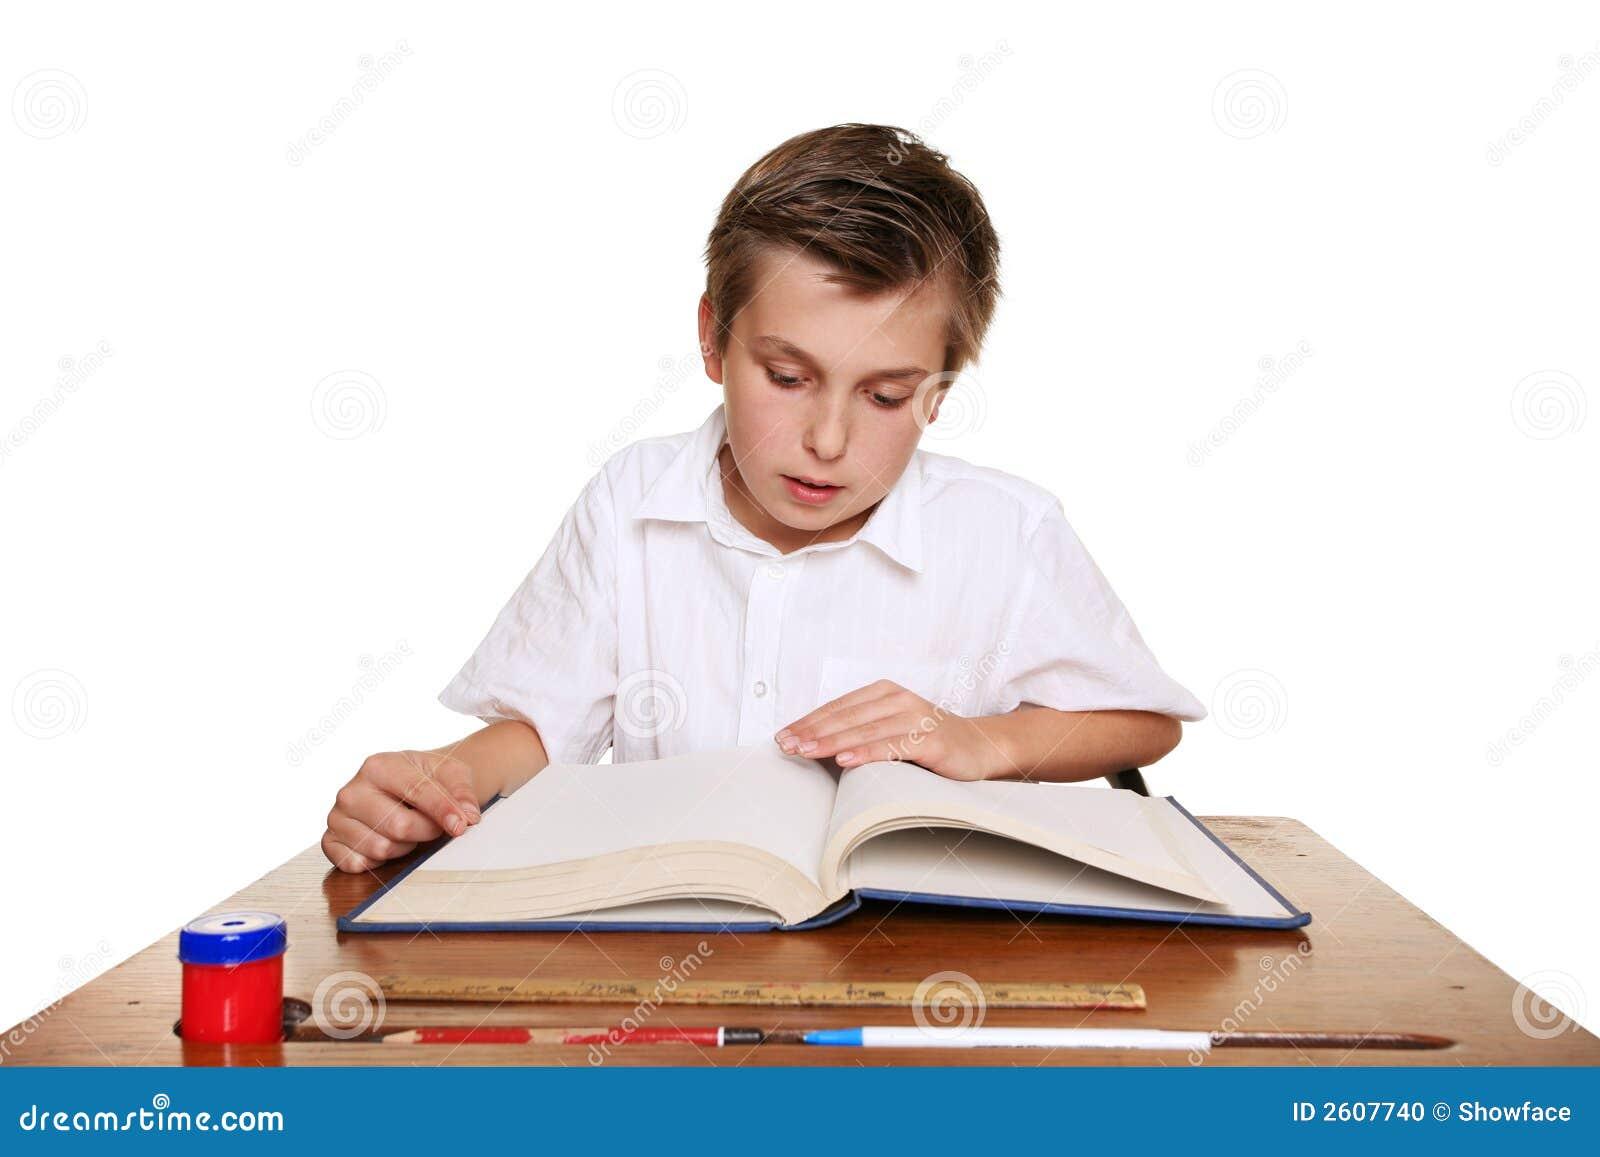 Straightforward essay have review Methods Revealed